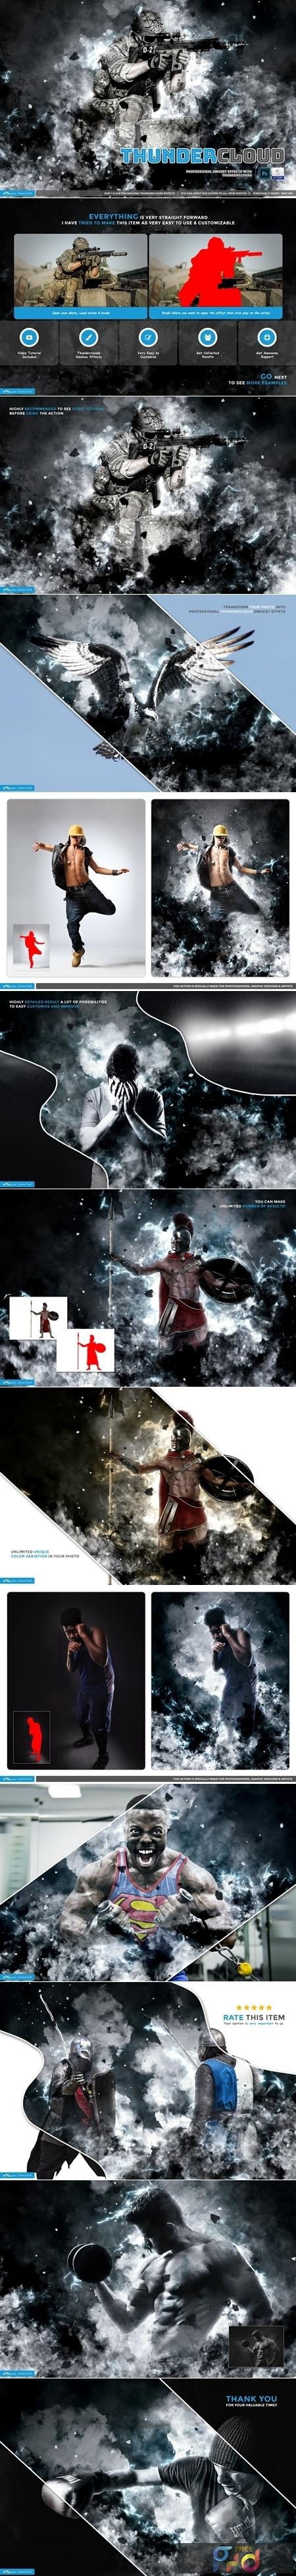 Thundercloud - Photoshop Action 4247697 1